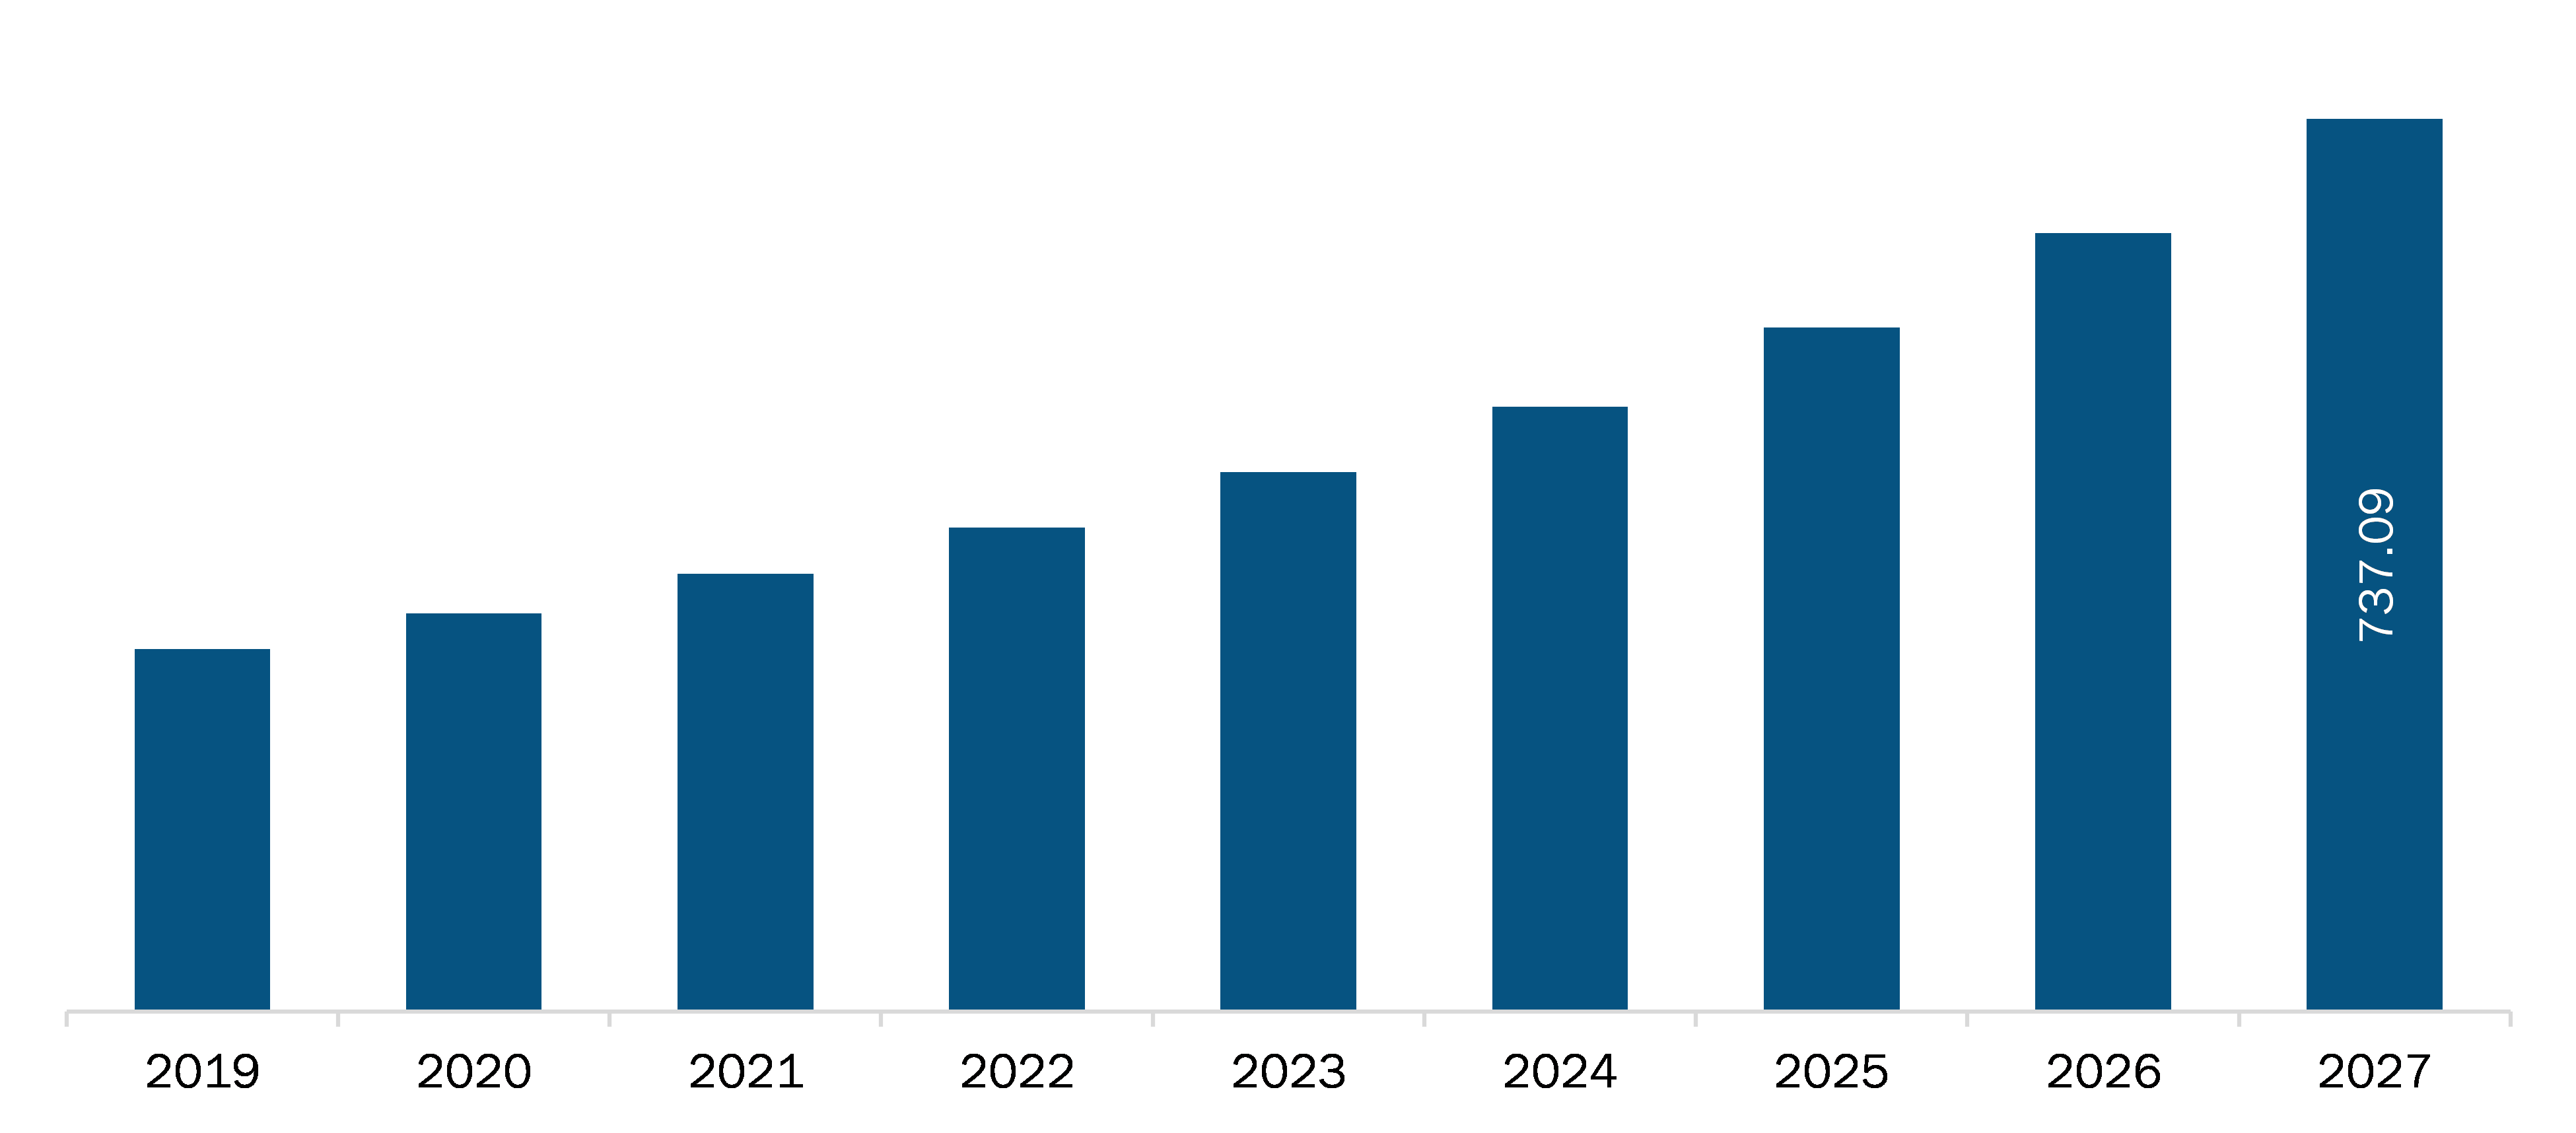 India Neuromodulation Market Revenue and Forecast to 2027 (US$ Million)